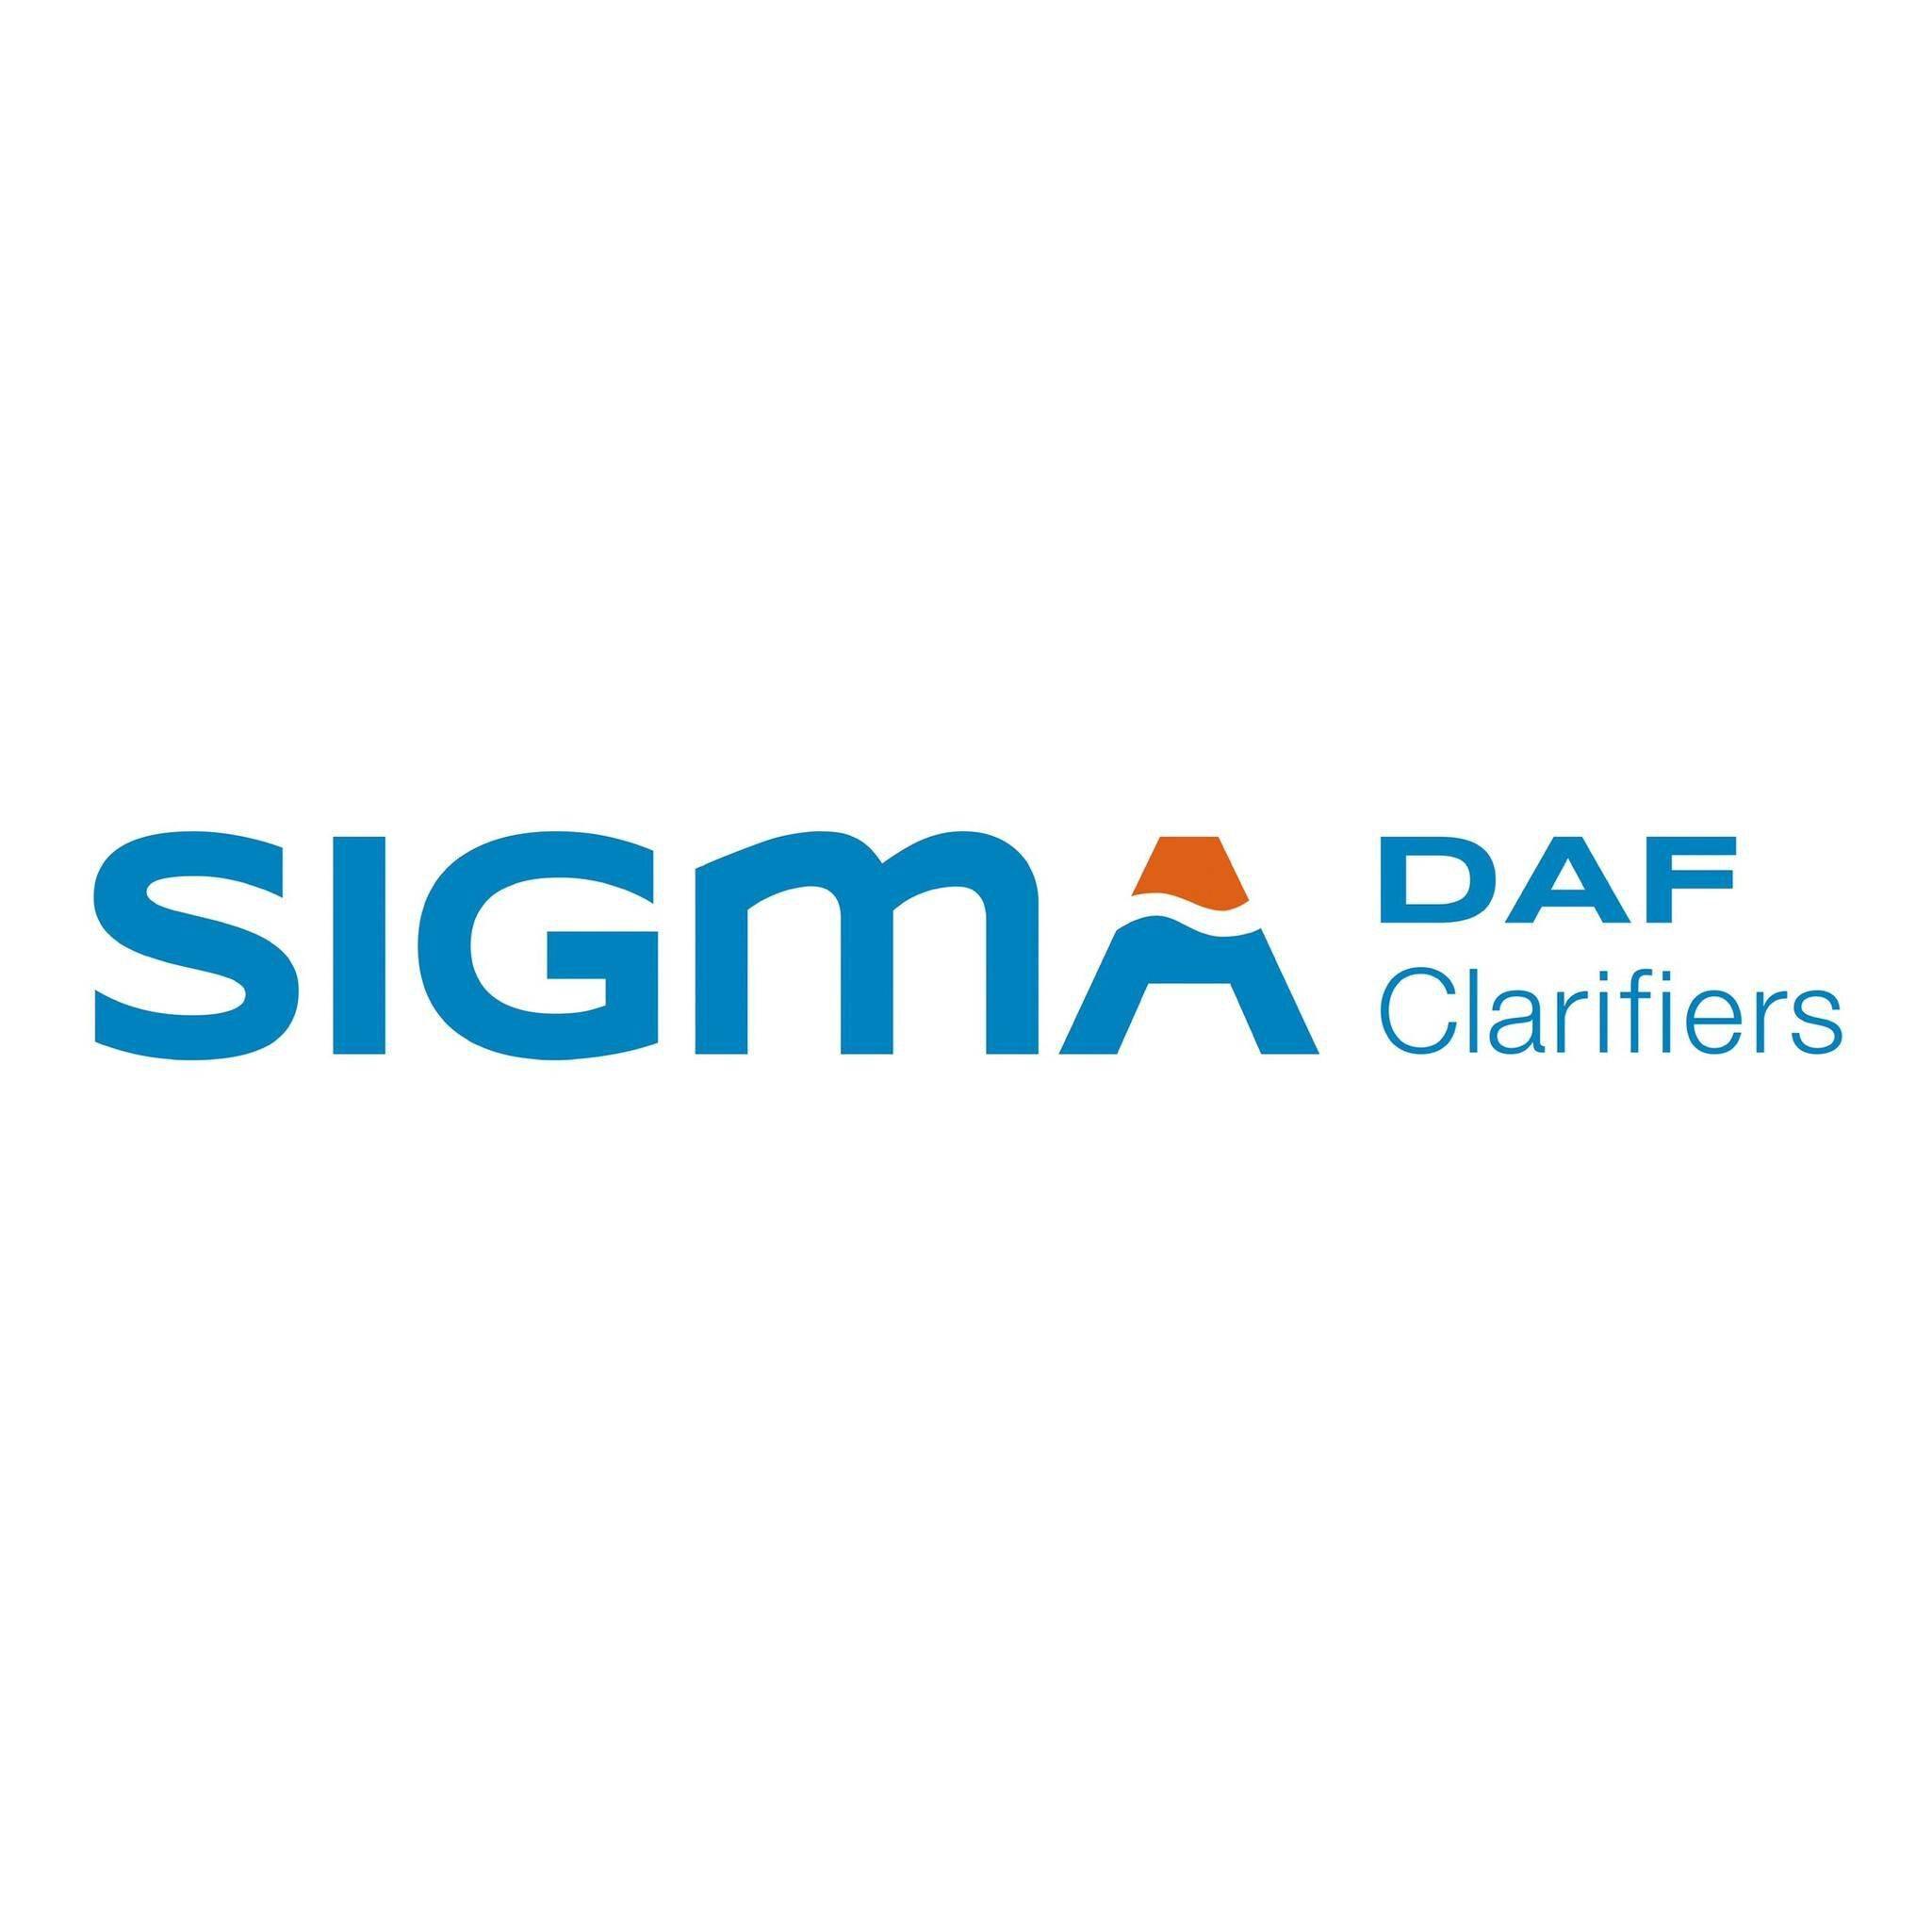 Company logo of SIGMADAF Clarifiers SL